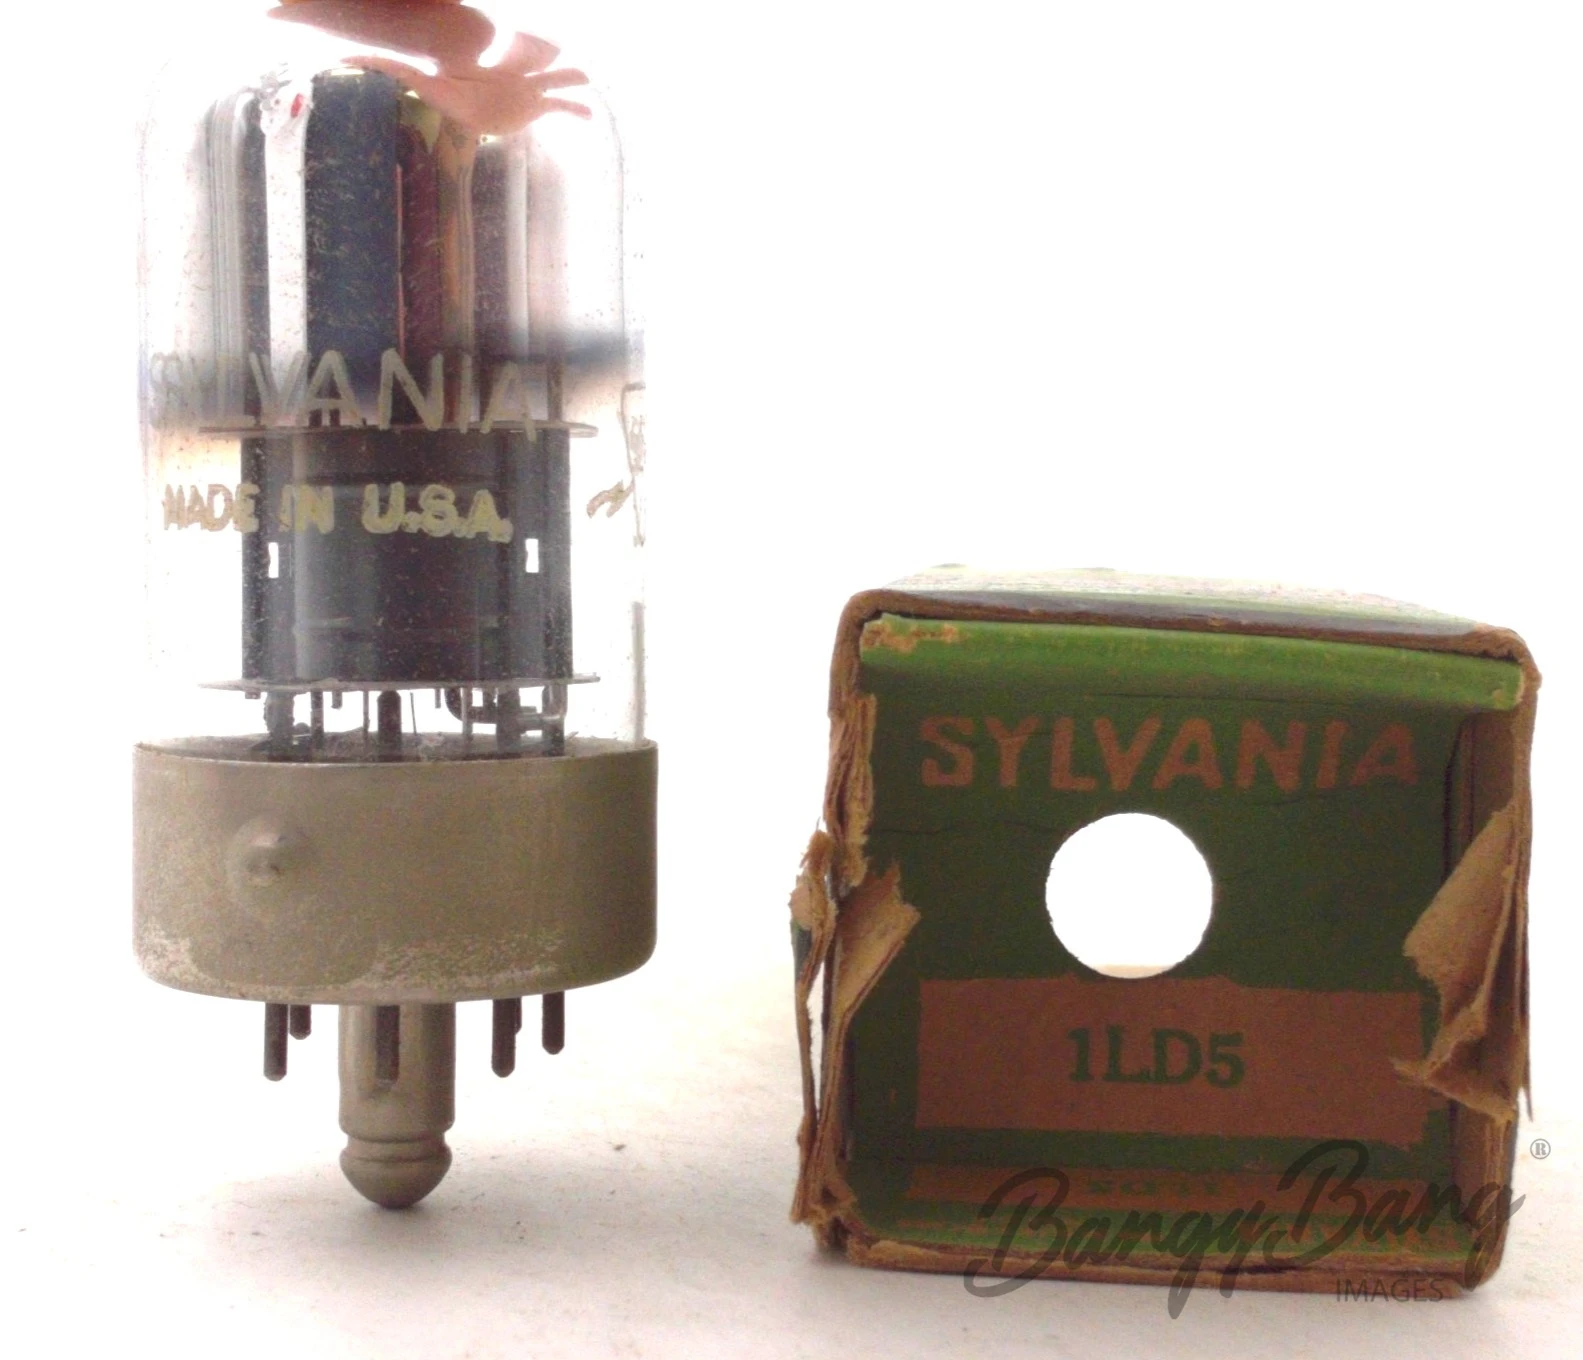 BangyBang Tubes Vintage Philco 1LD5//CV778 Diode Pentode Dry Battery Radio Valve